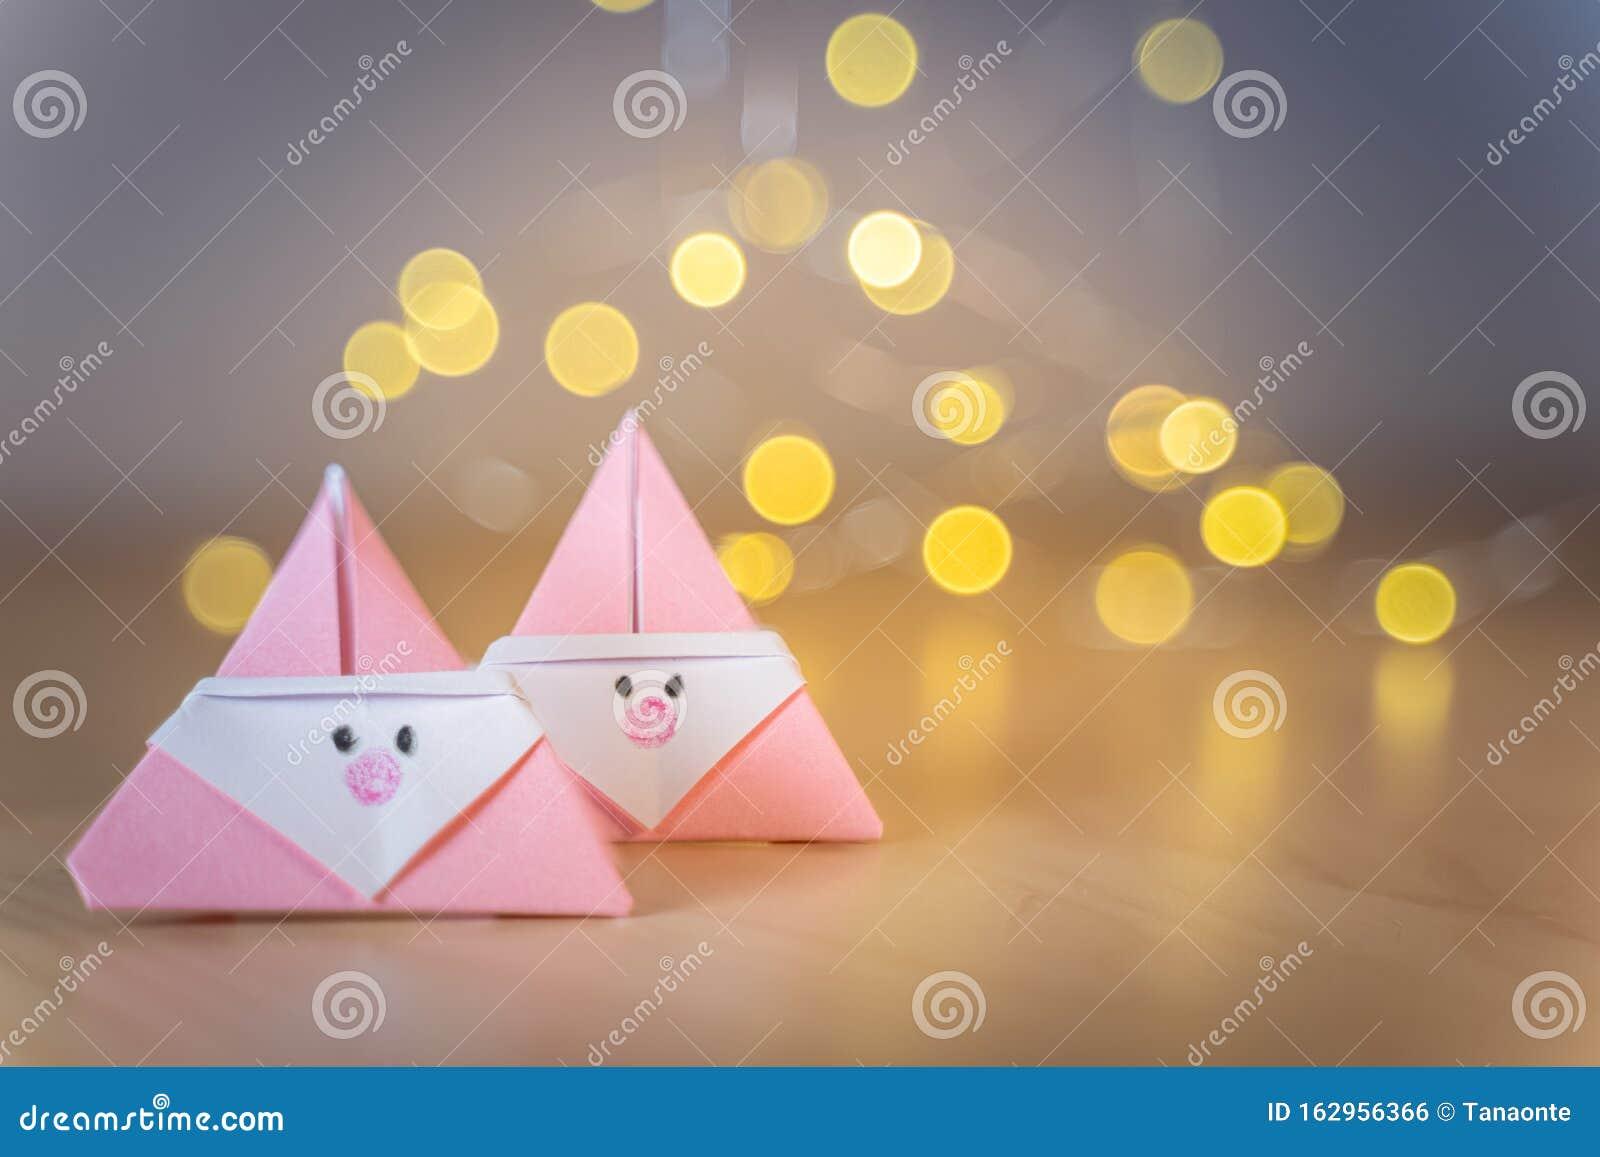 Pin on Origami String Light | 1155x1600